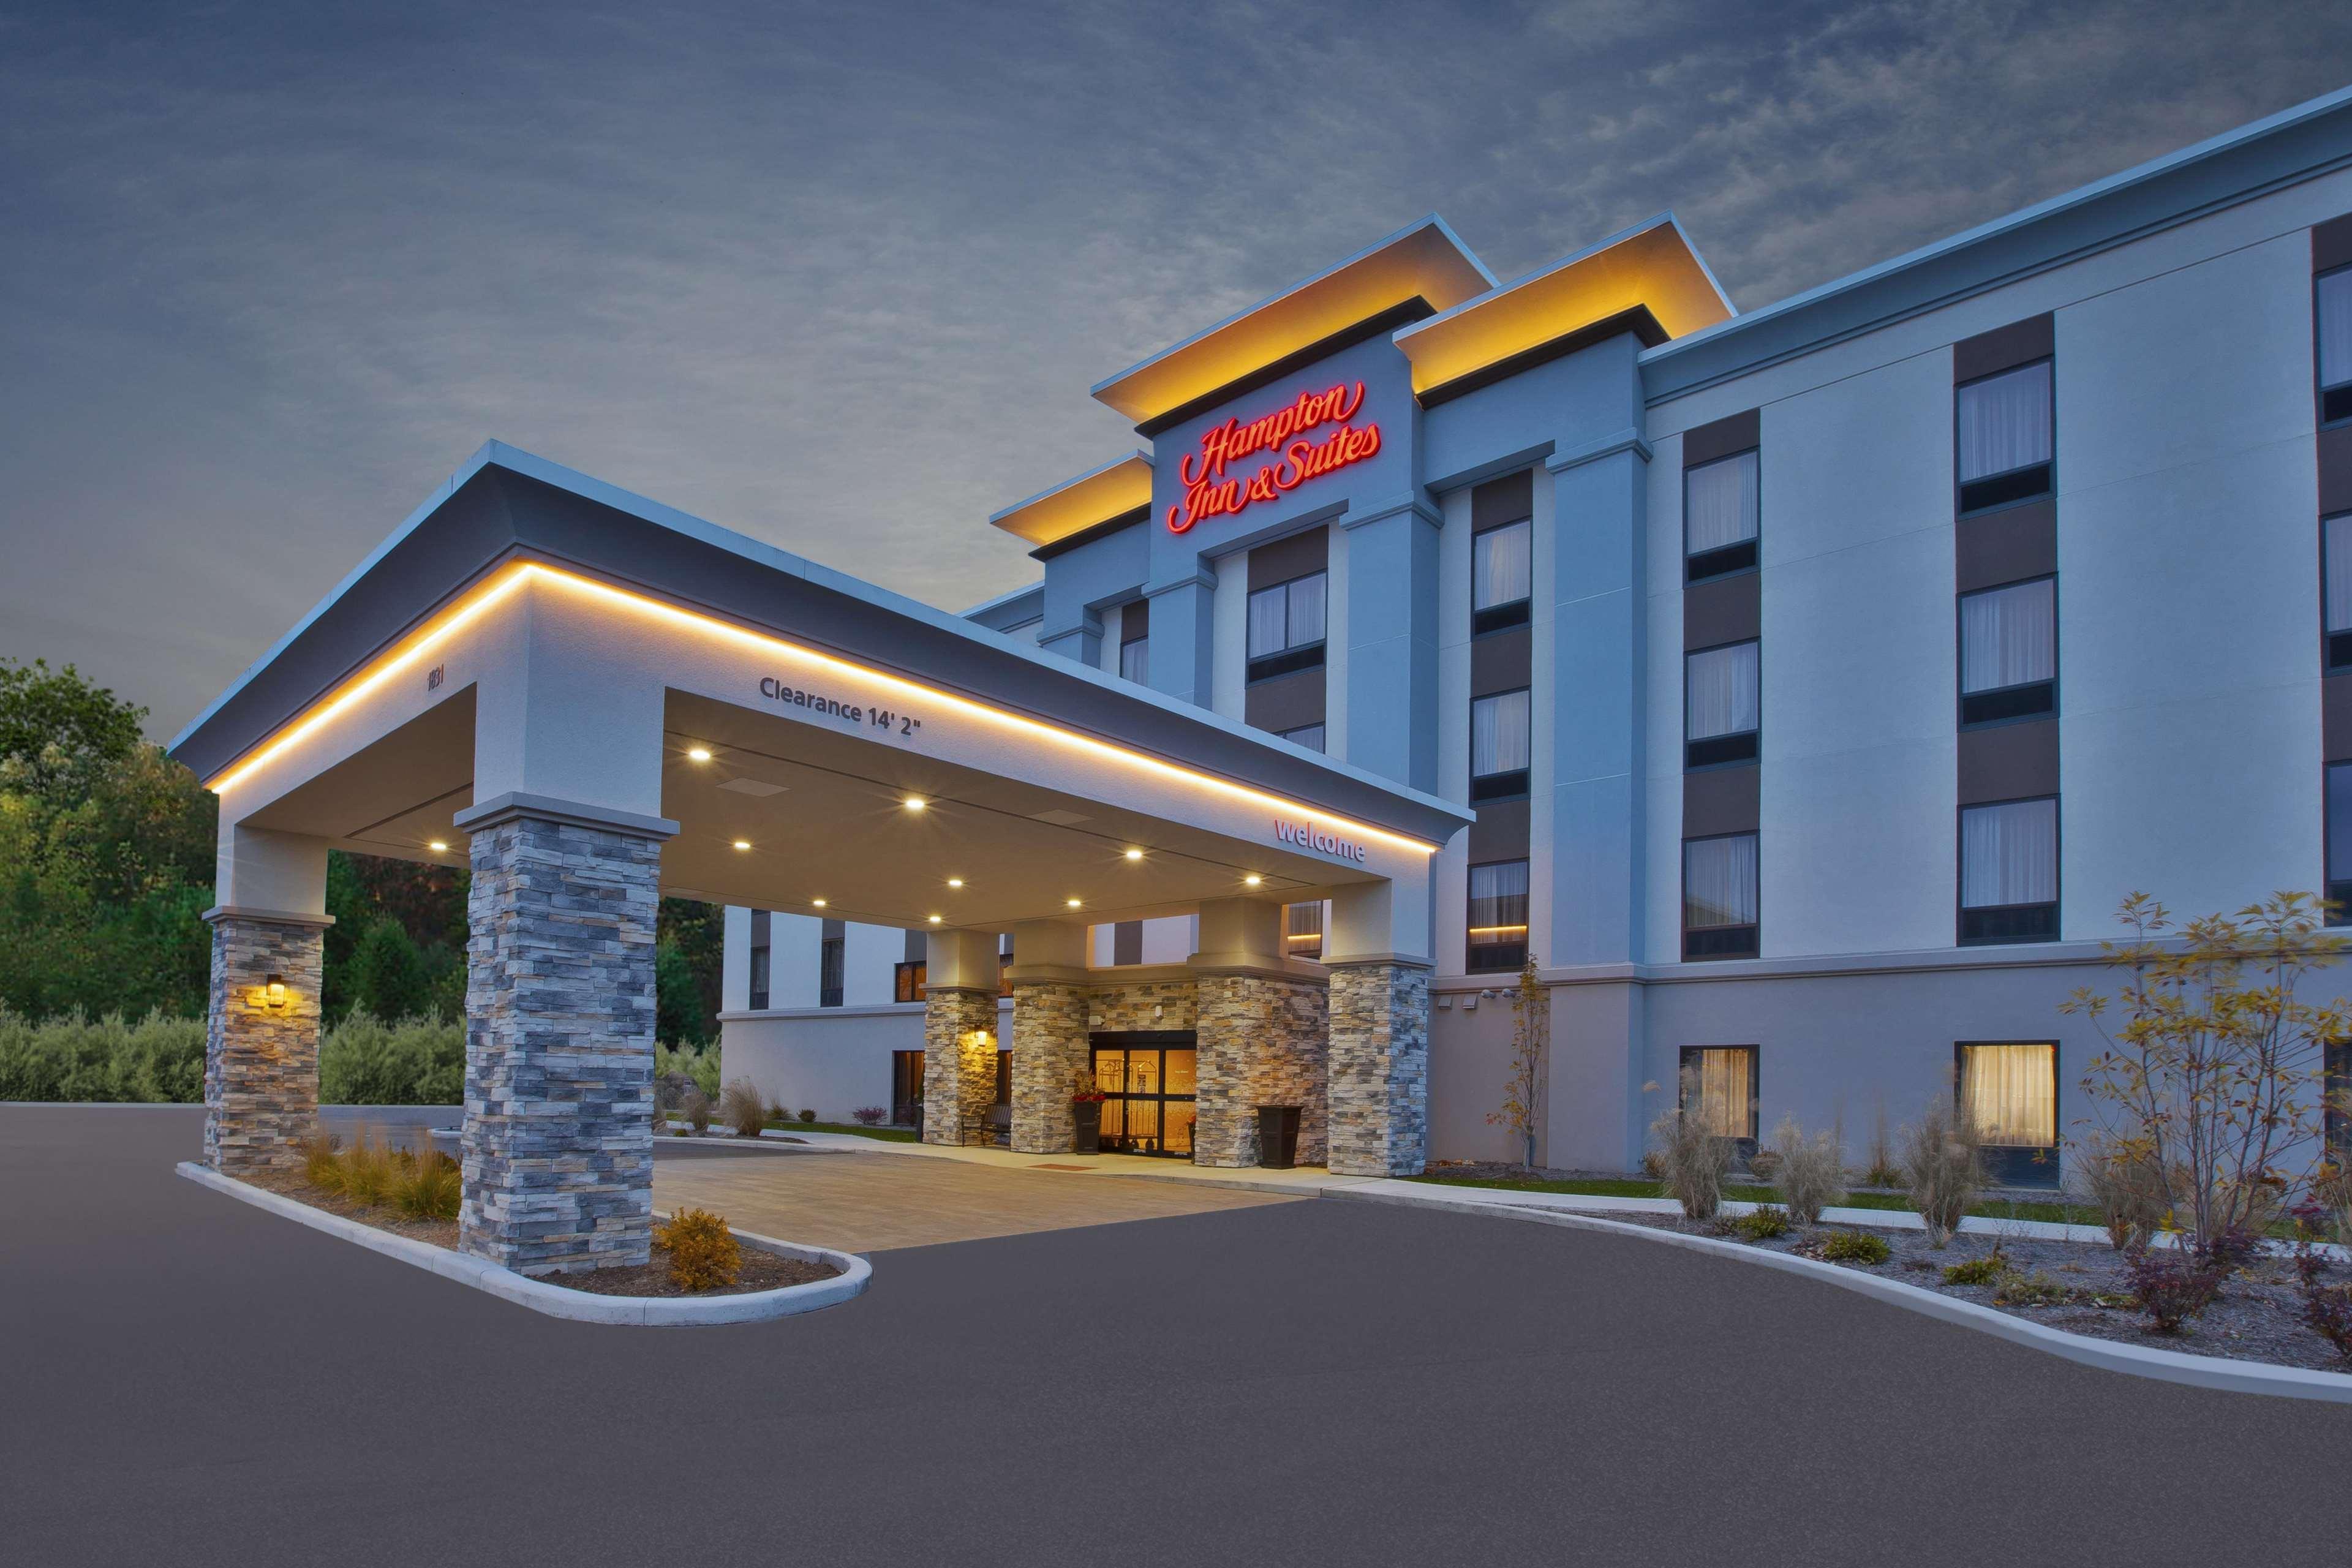 Hampton Inn & Suites Alliance image 1